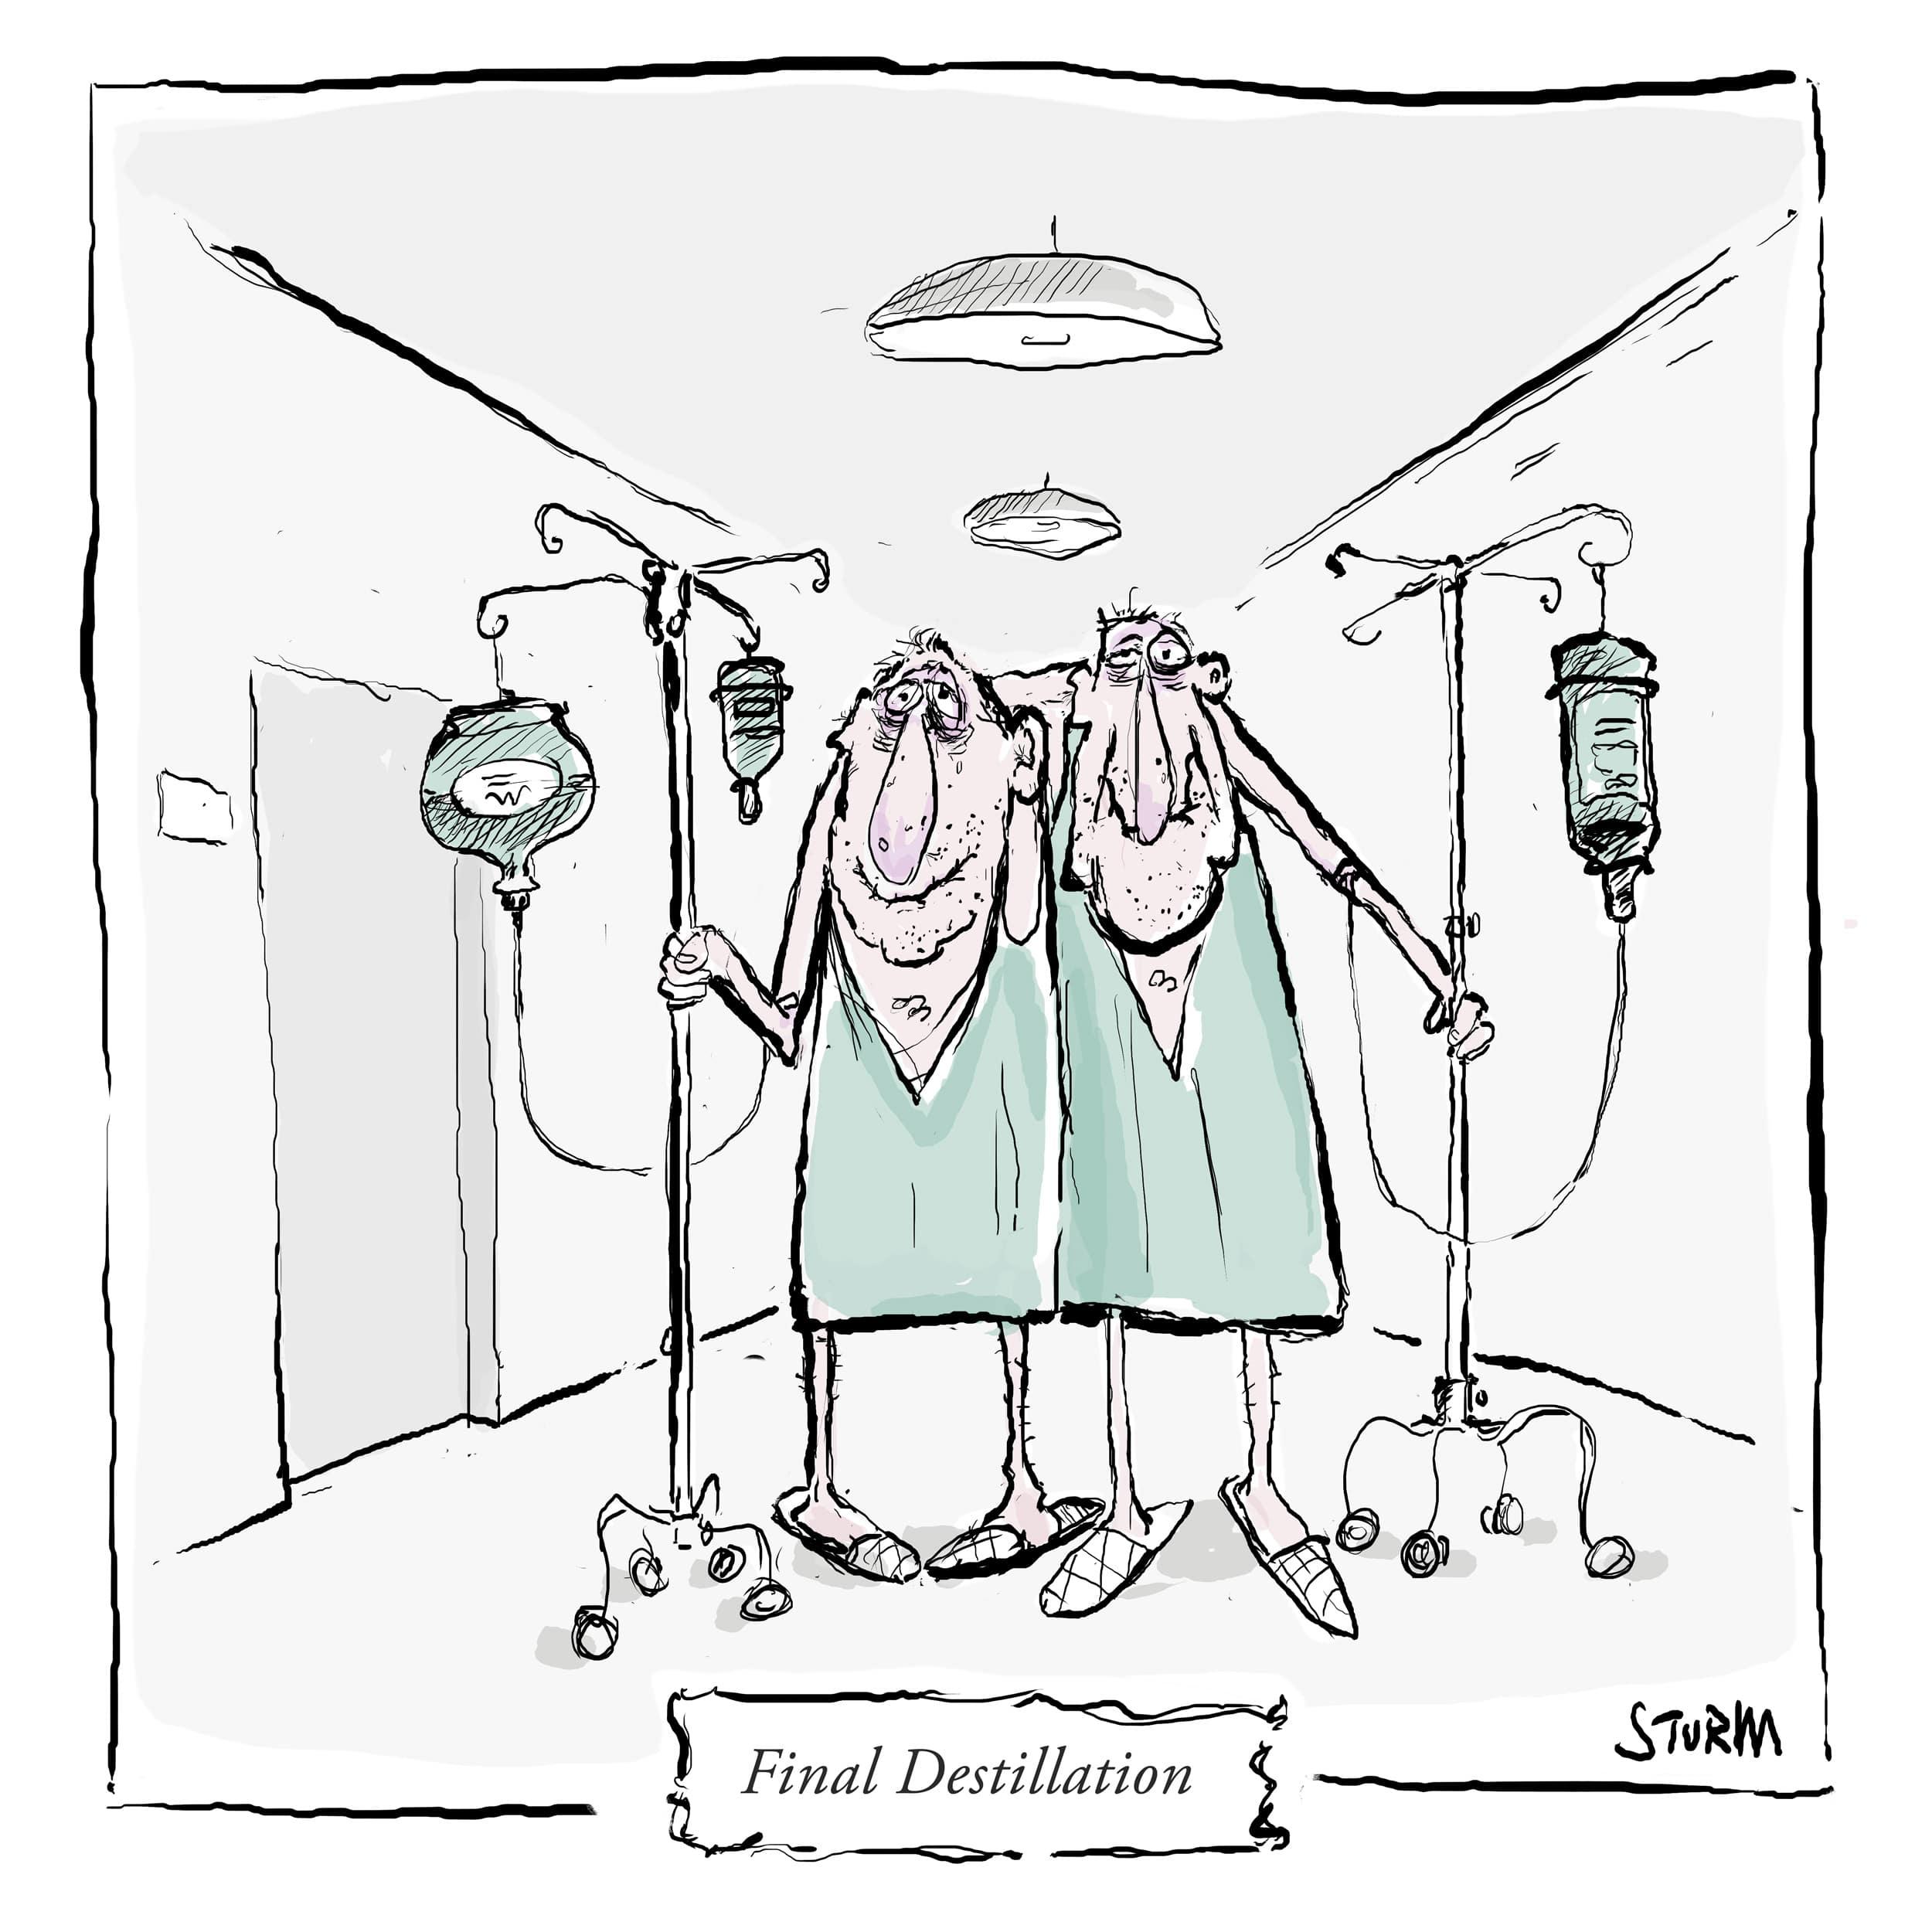 The Final Destillation - Cartoon Philipp Sturm